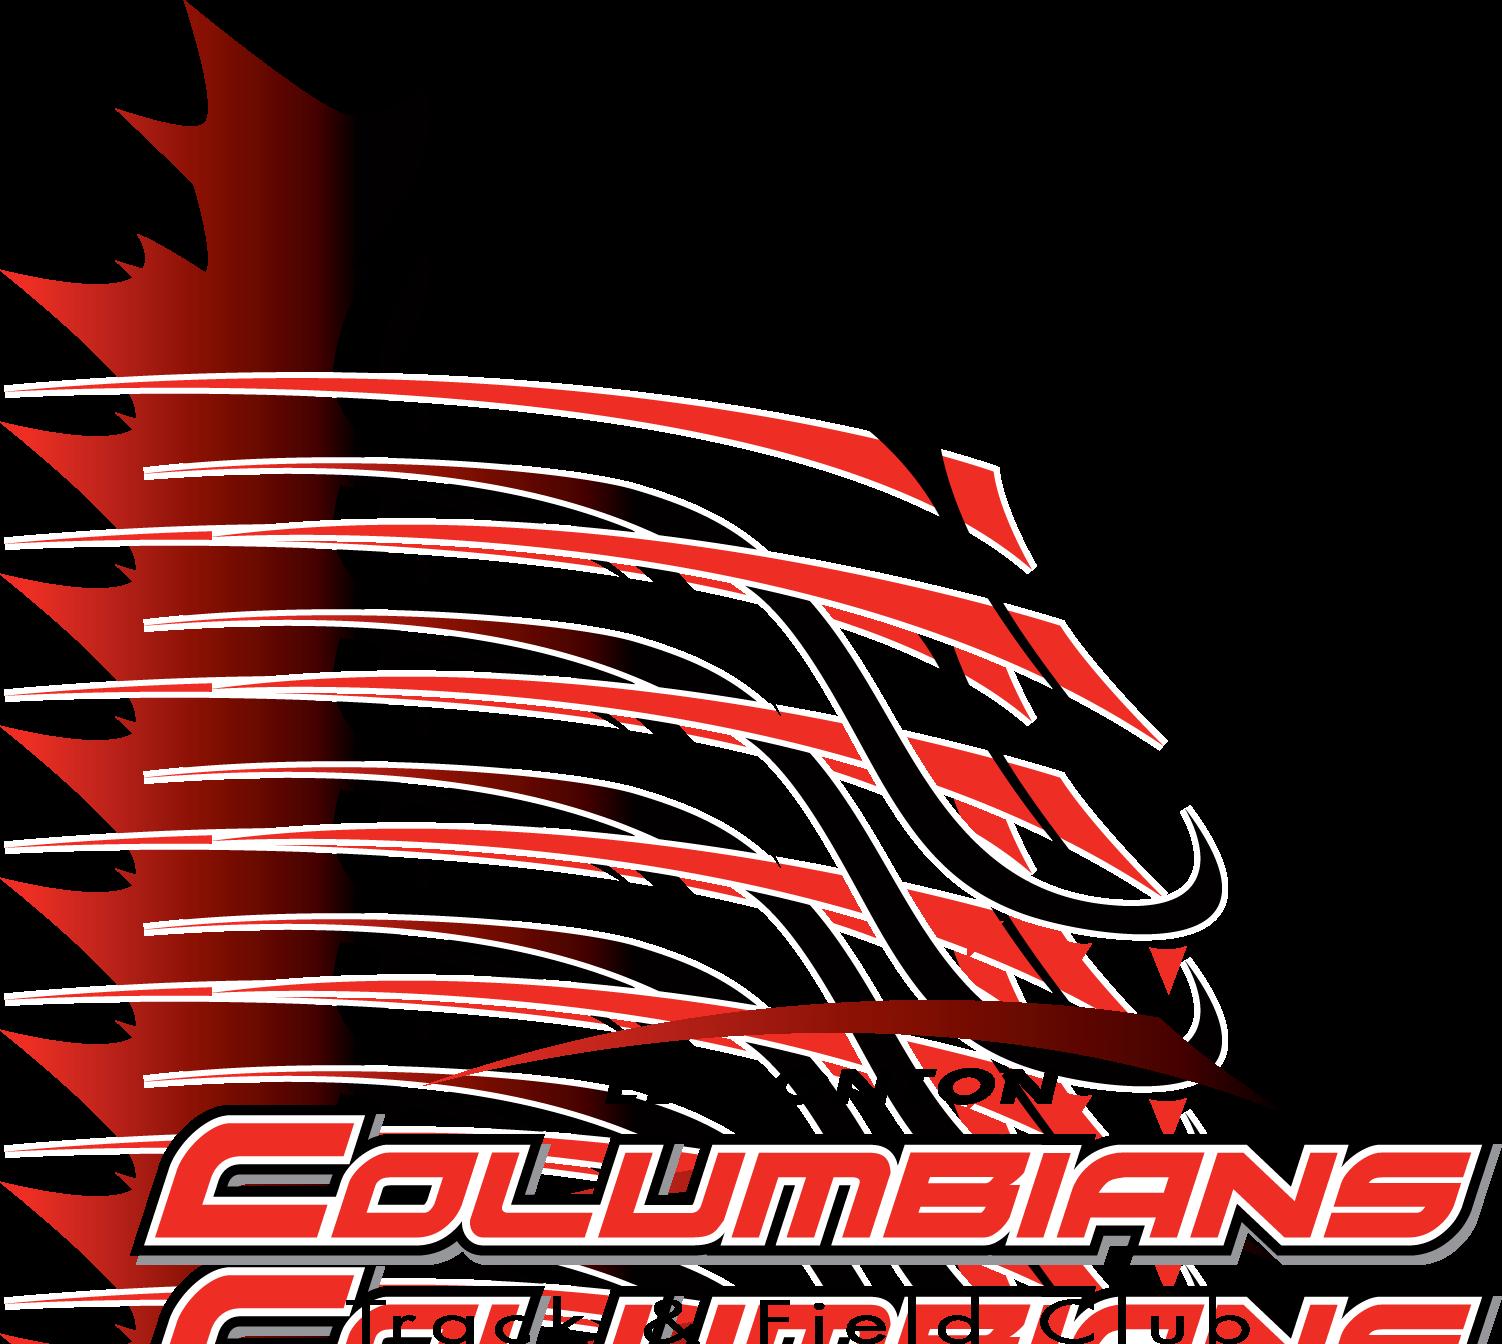 Edmonton Columbians Track and Field Club